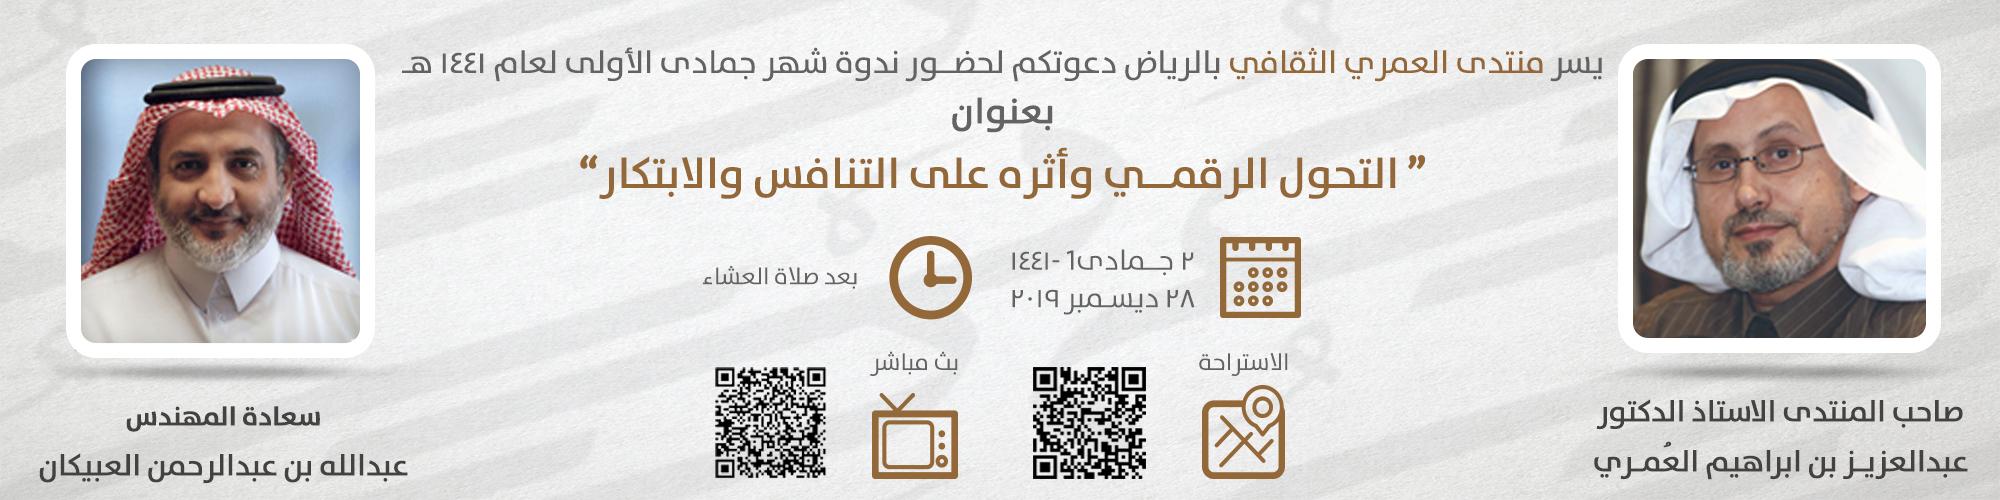 http://omaryforum.com/wp-content/uploads/2019/12/التصميم.jpg